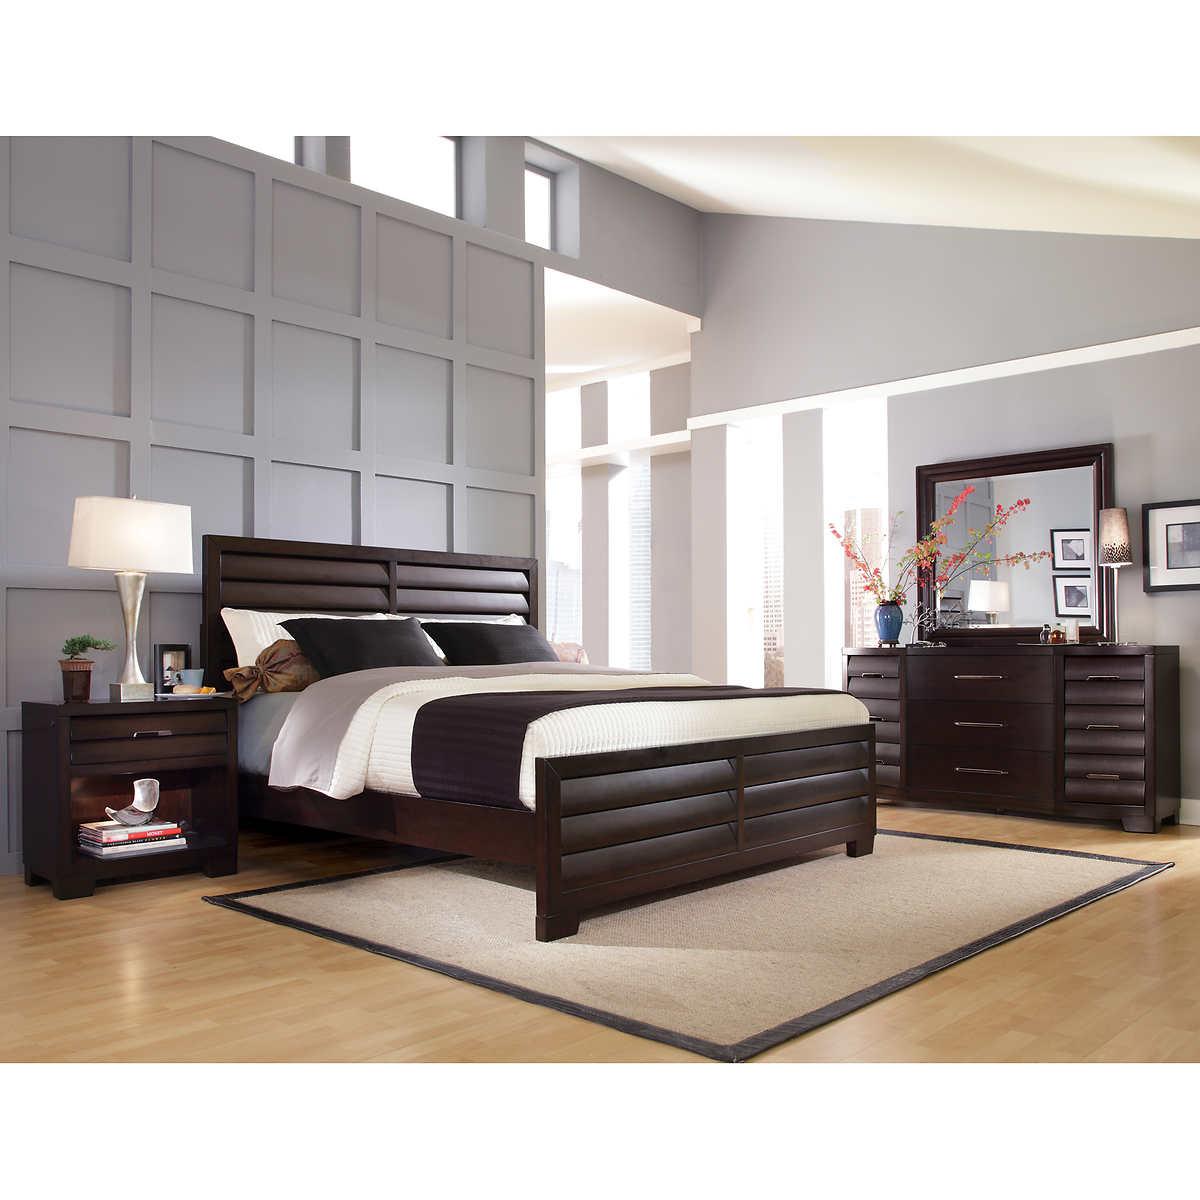 pulaski furniture king bedroom sets | costco